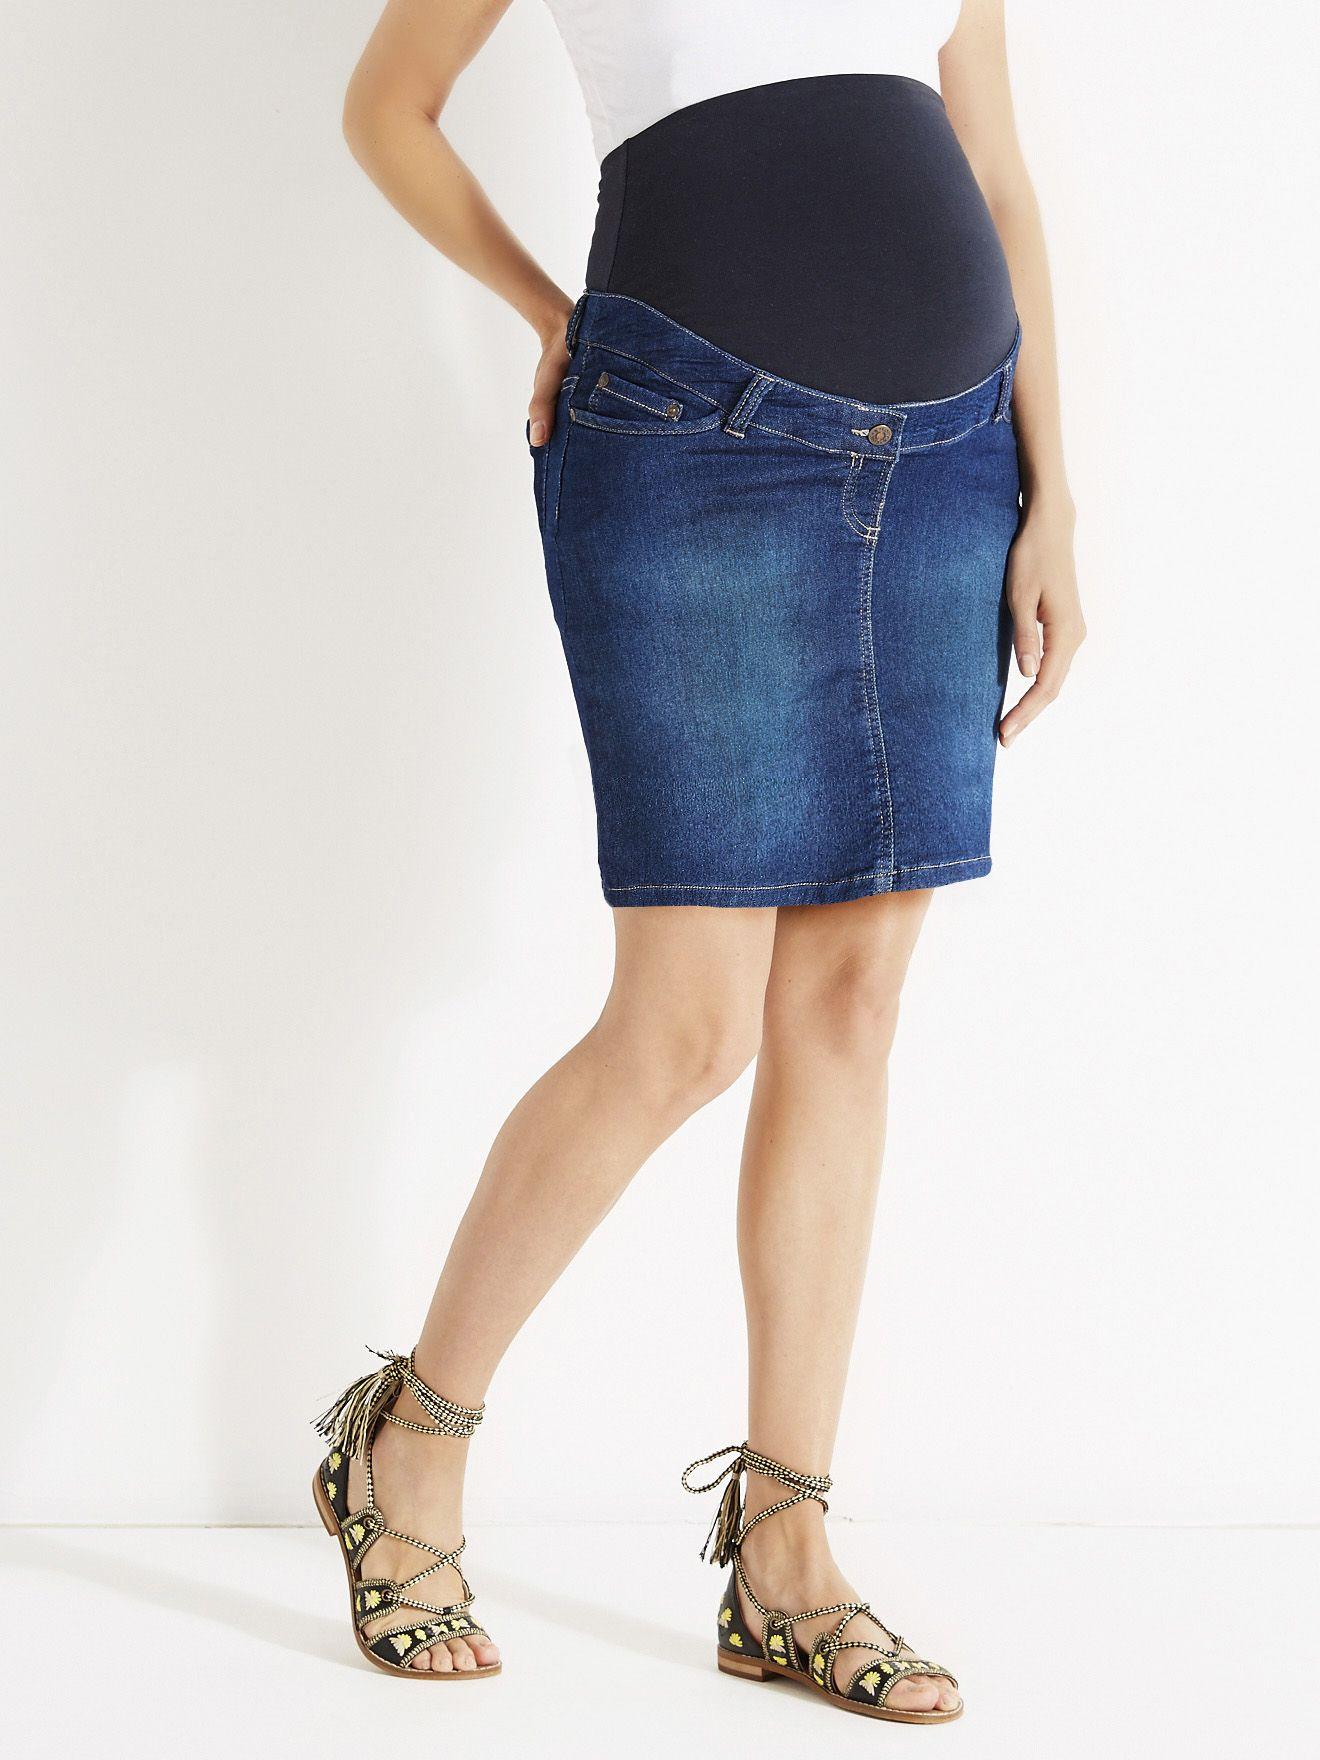 Jupe courte de grossesse molleton effet jean